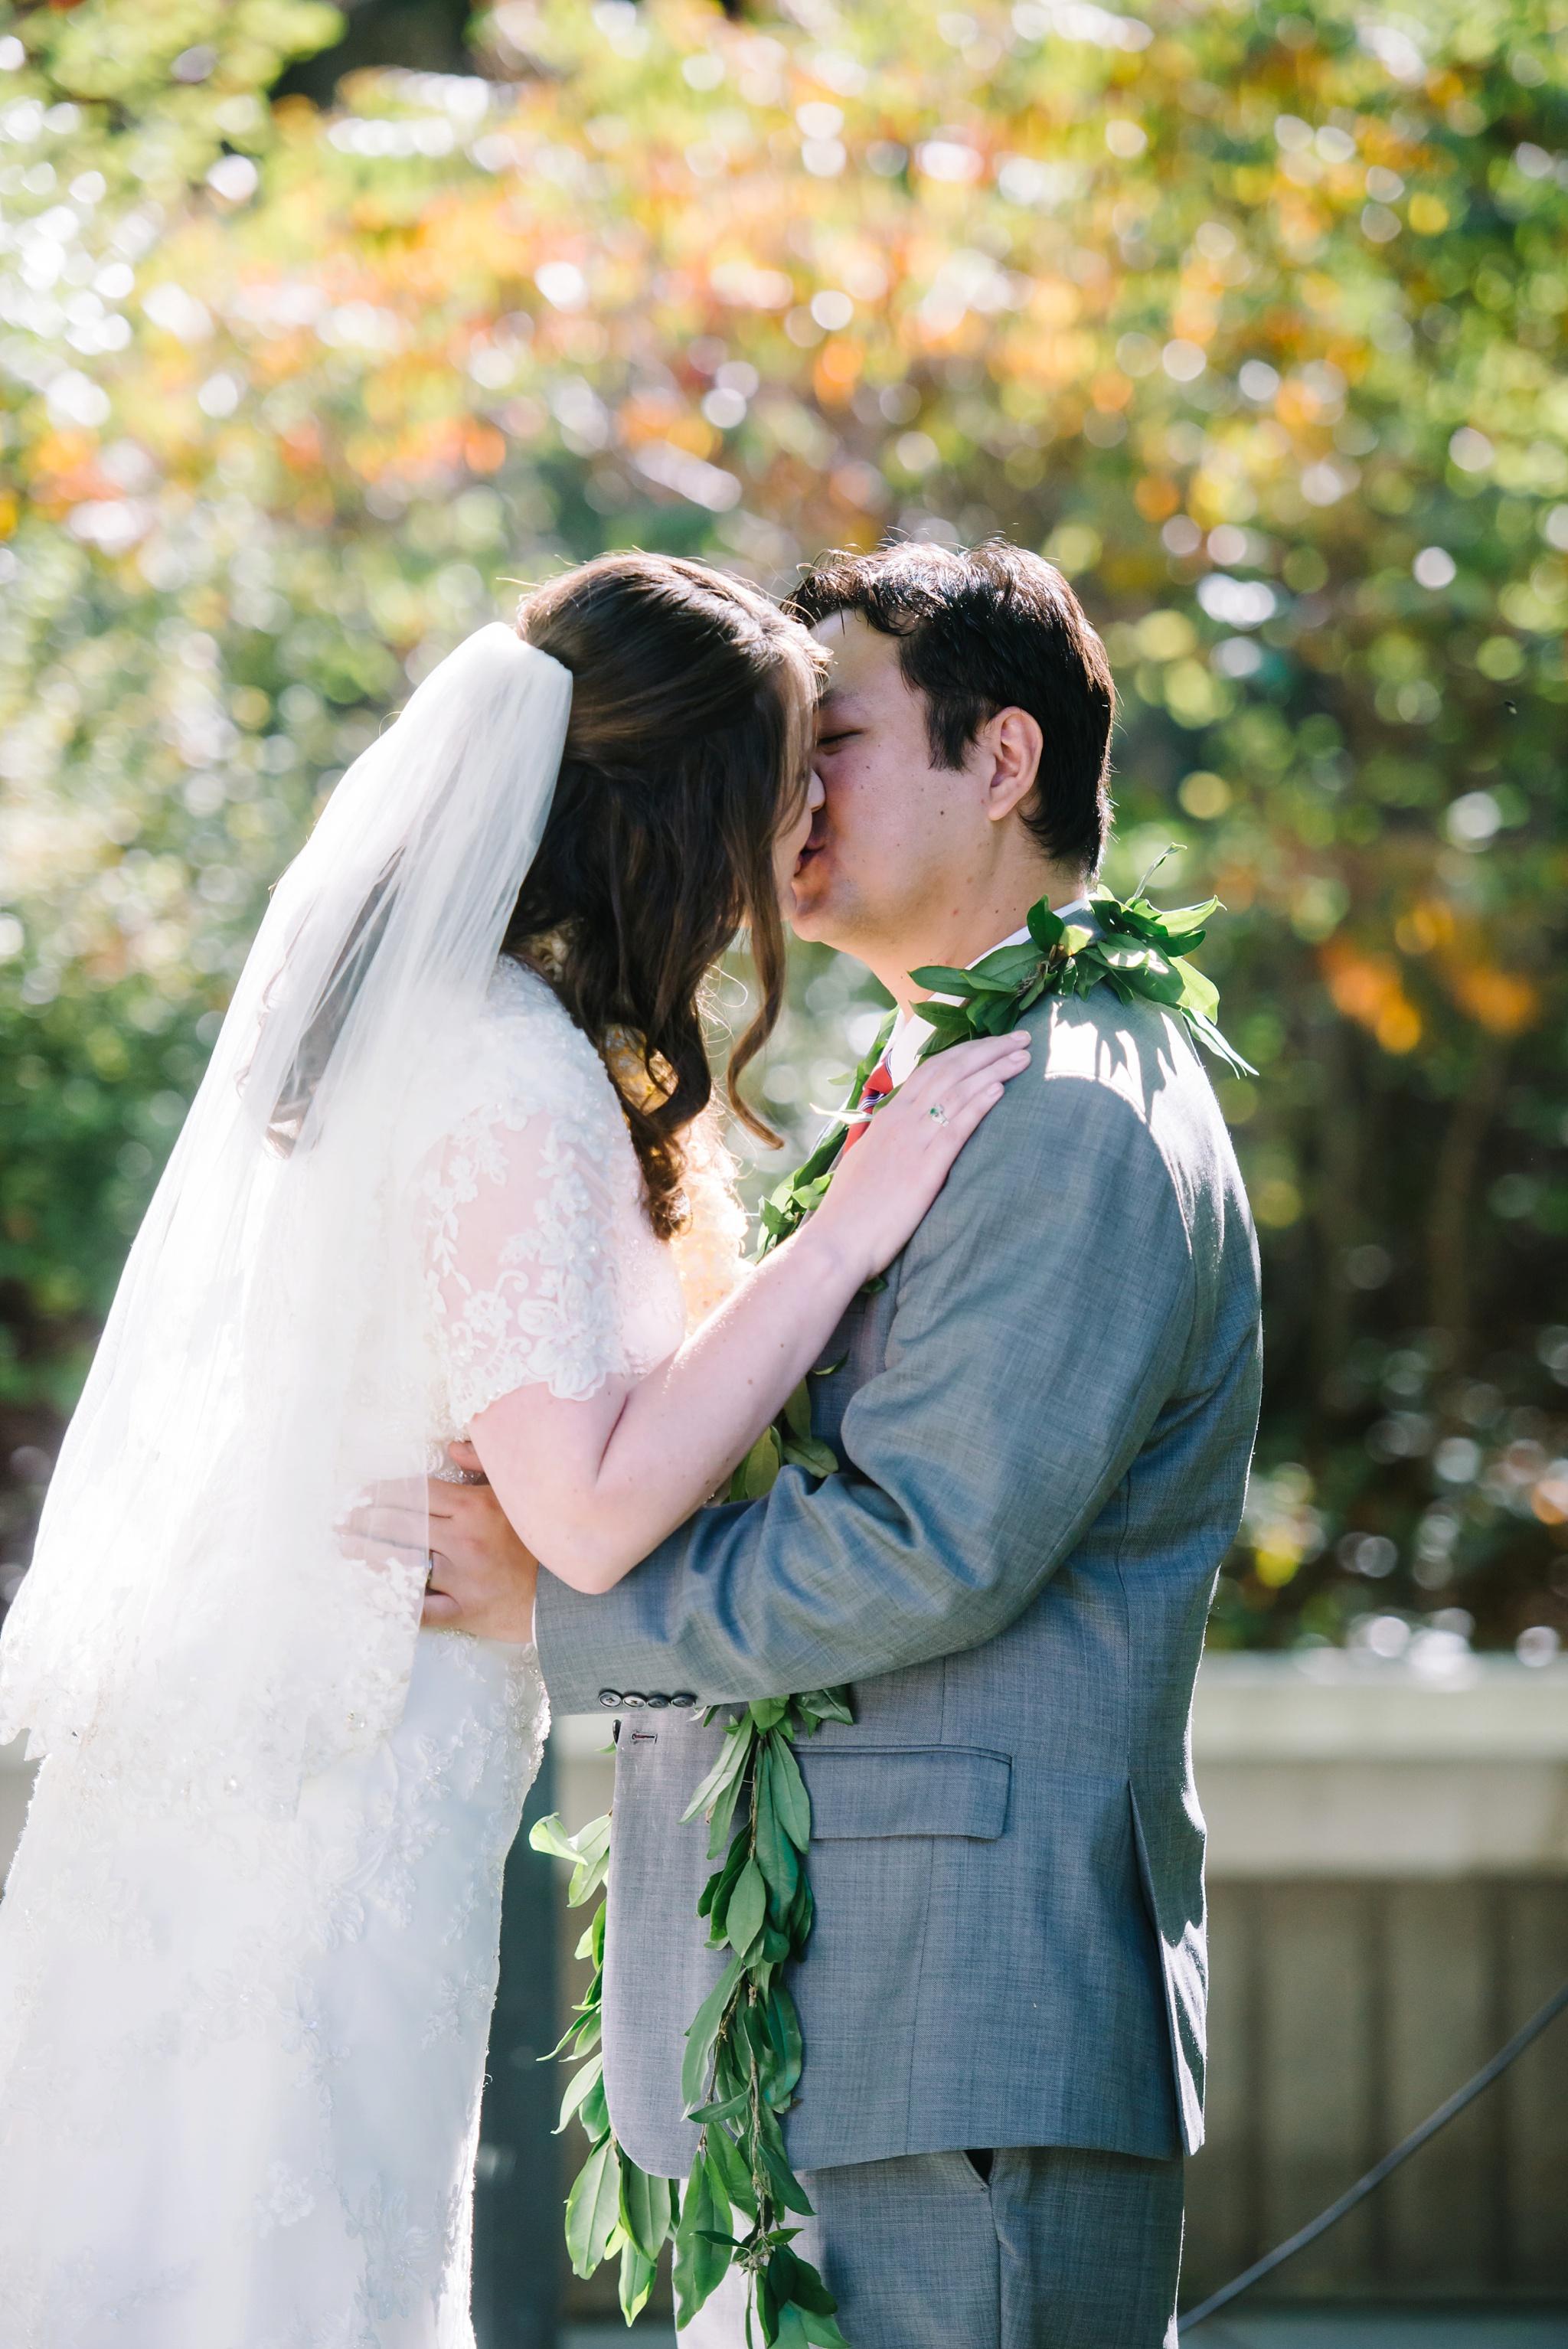 Park City Wedding Photographer Ali Sumsion 045